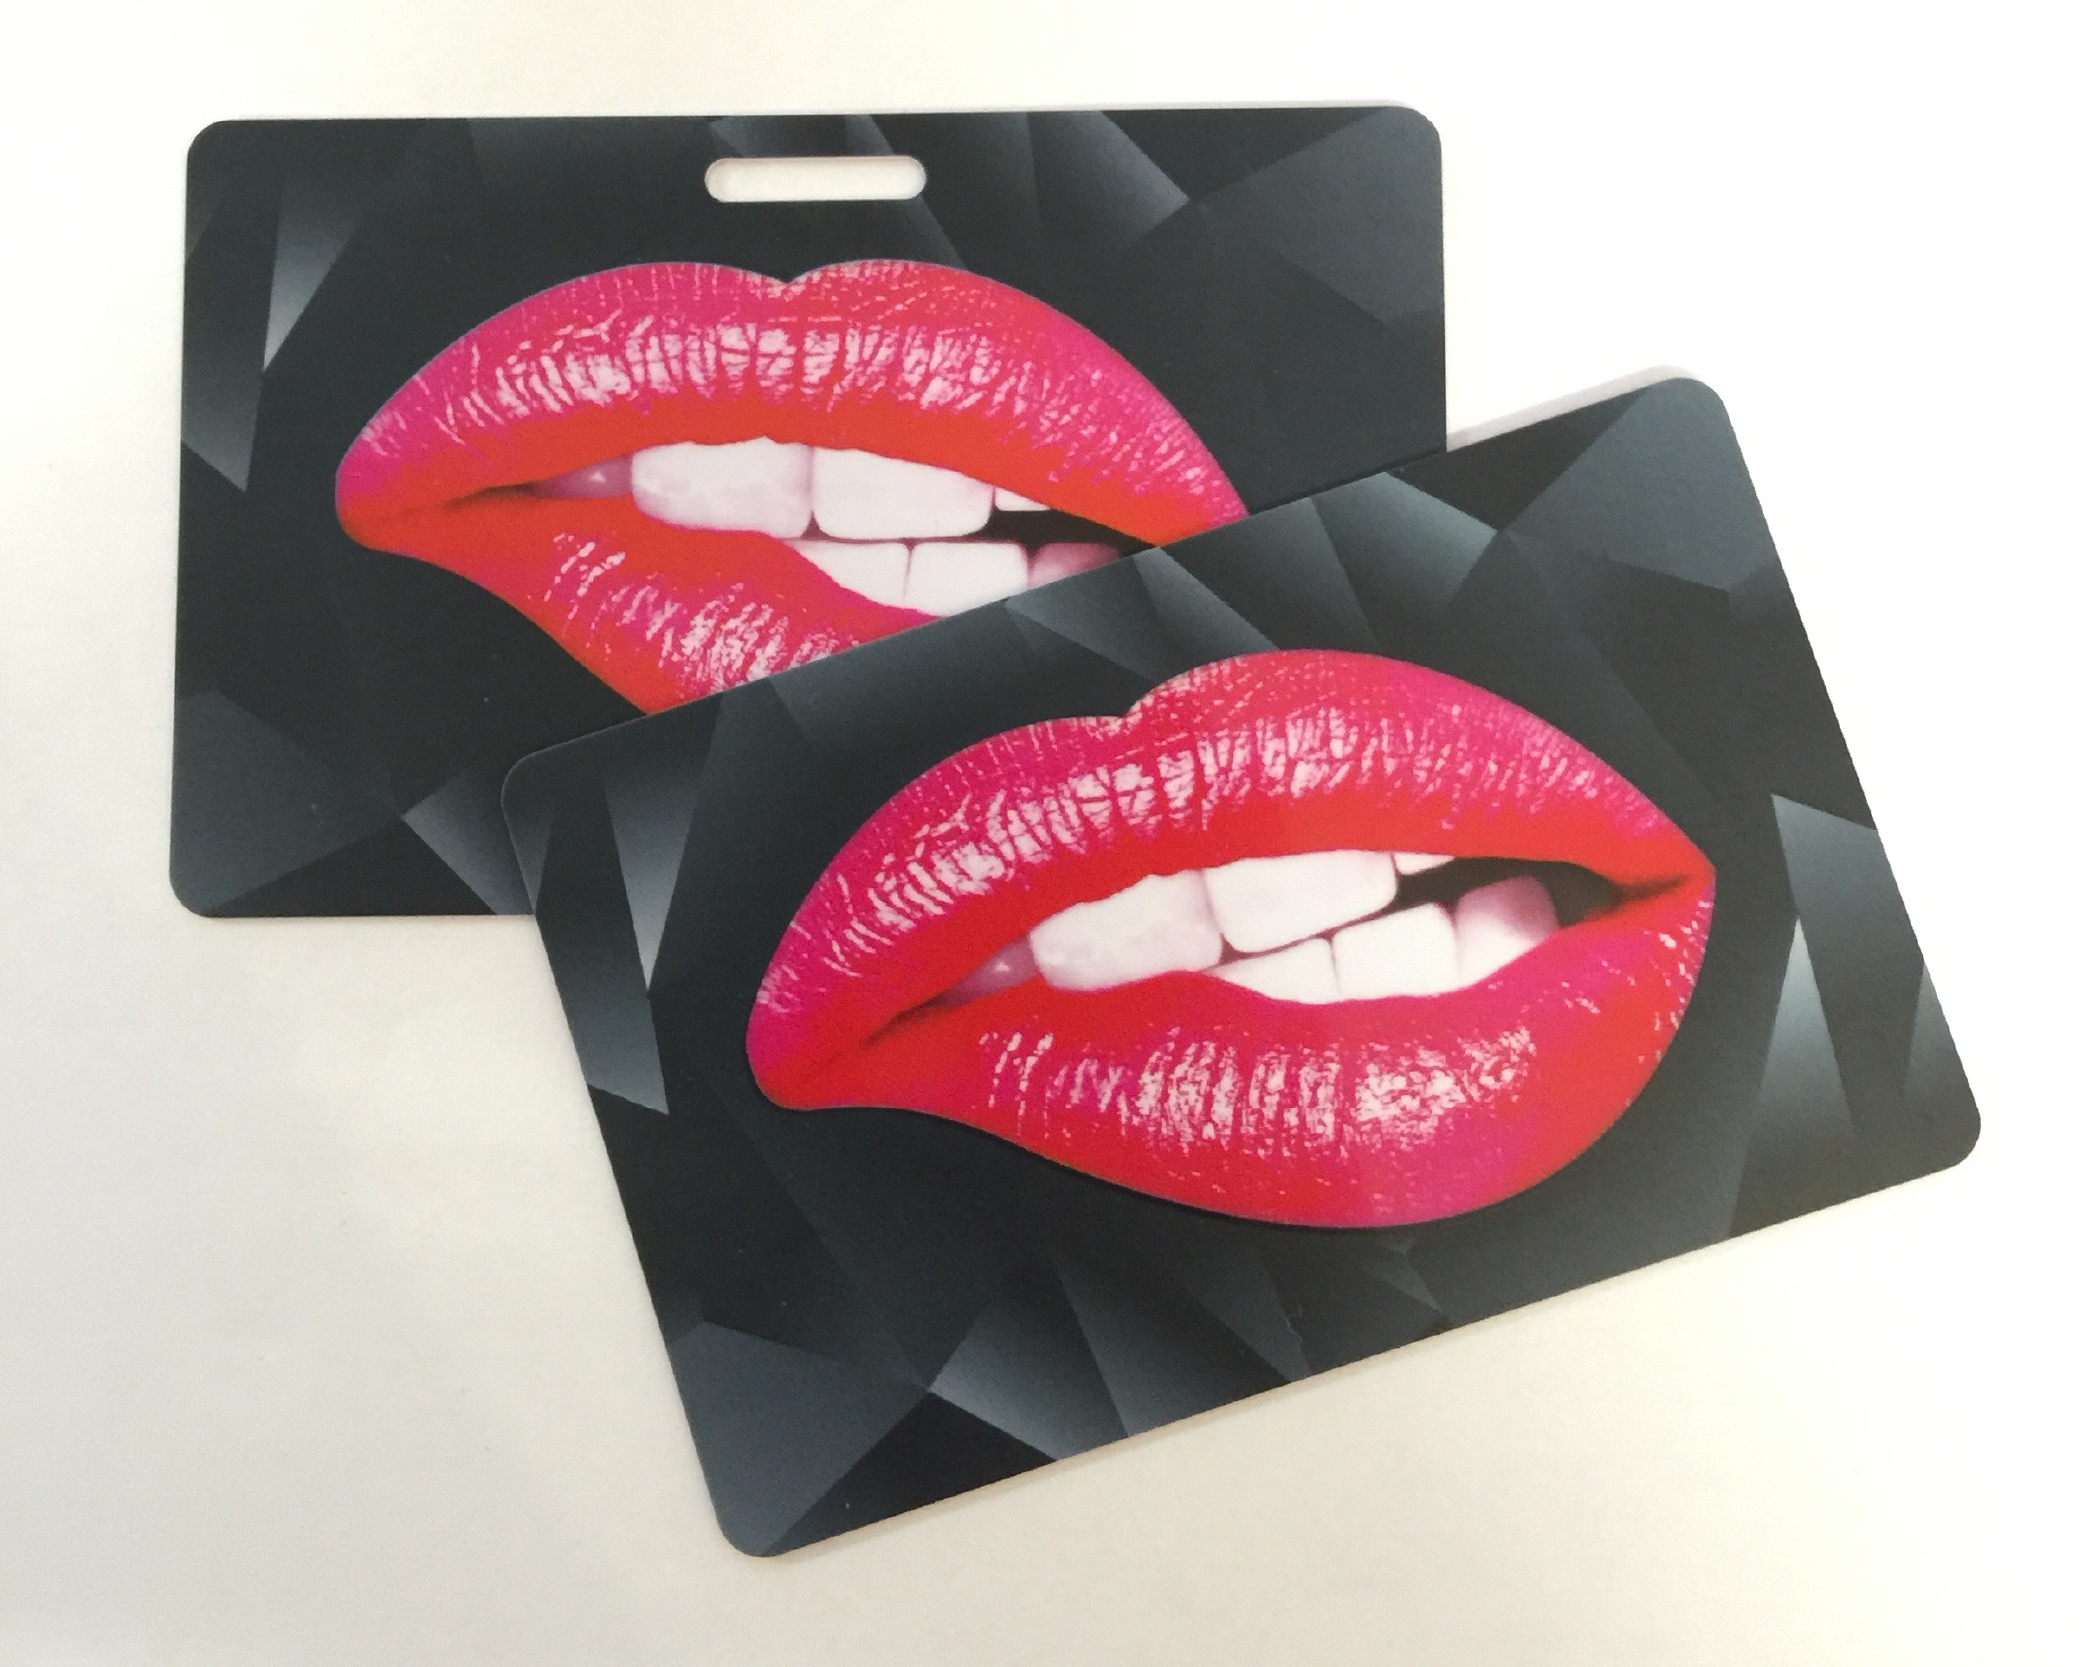 Spot Uv / Spot Gloss Plastic Business Card!! Smooth matt lamination ...